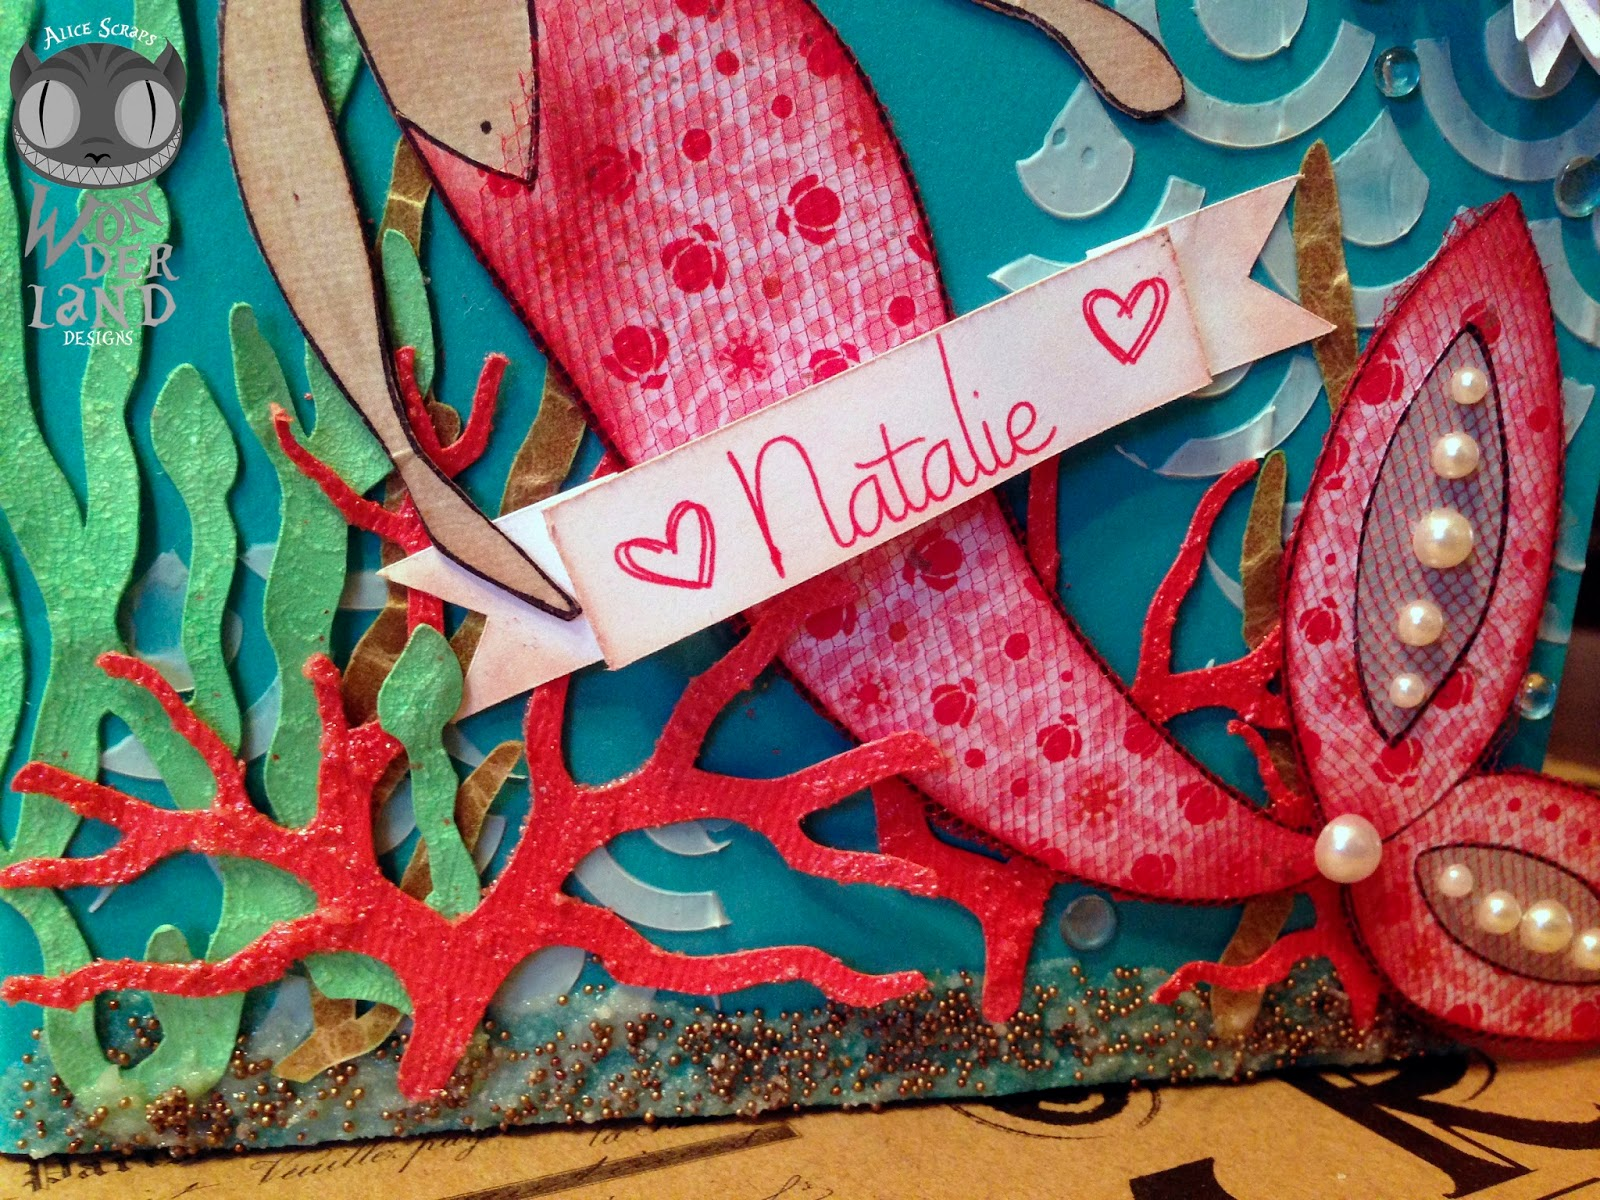 Scrapbook paper case - Scrapbook Scrapbooking Mixed Media Paper Crafting Mermaid Ocean Sea